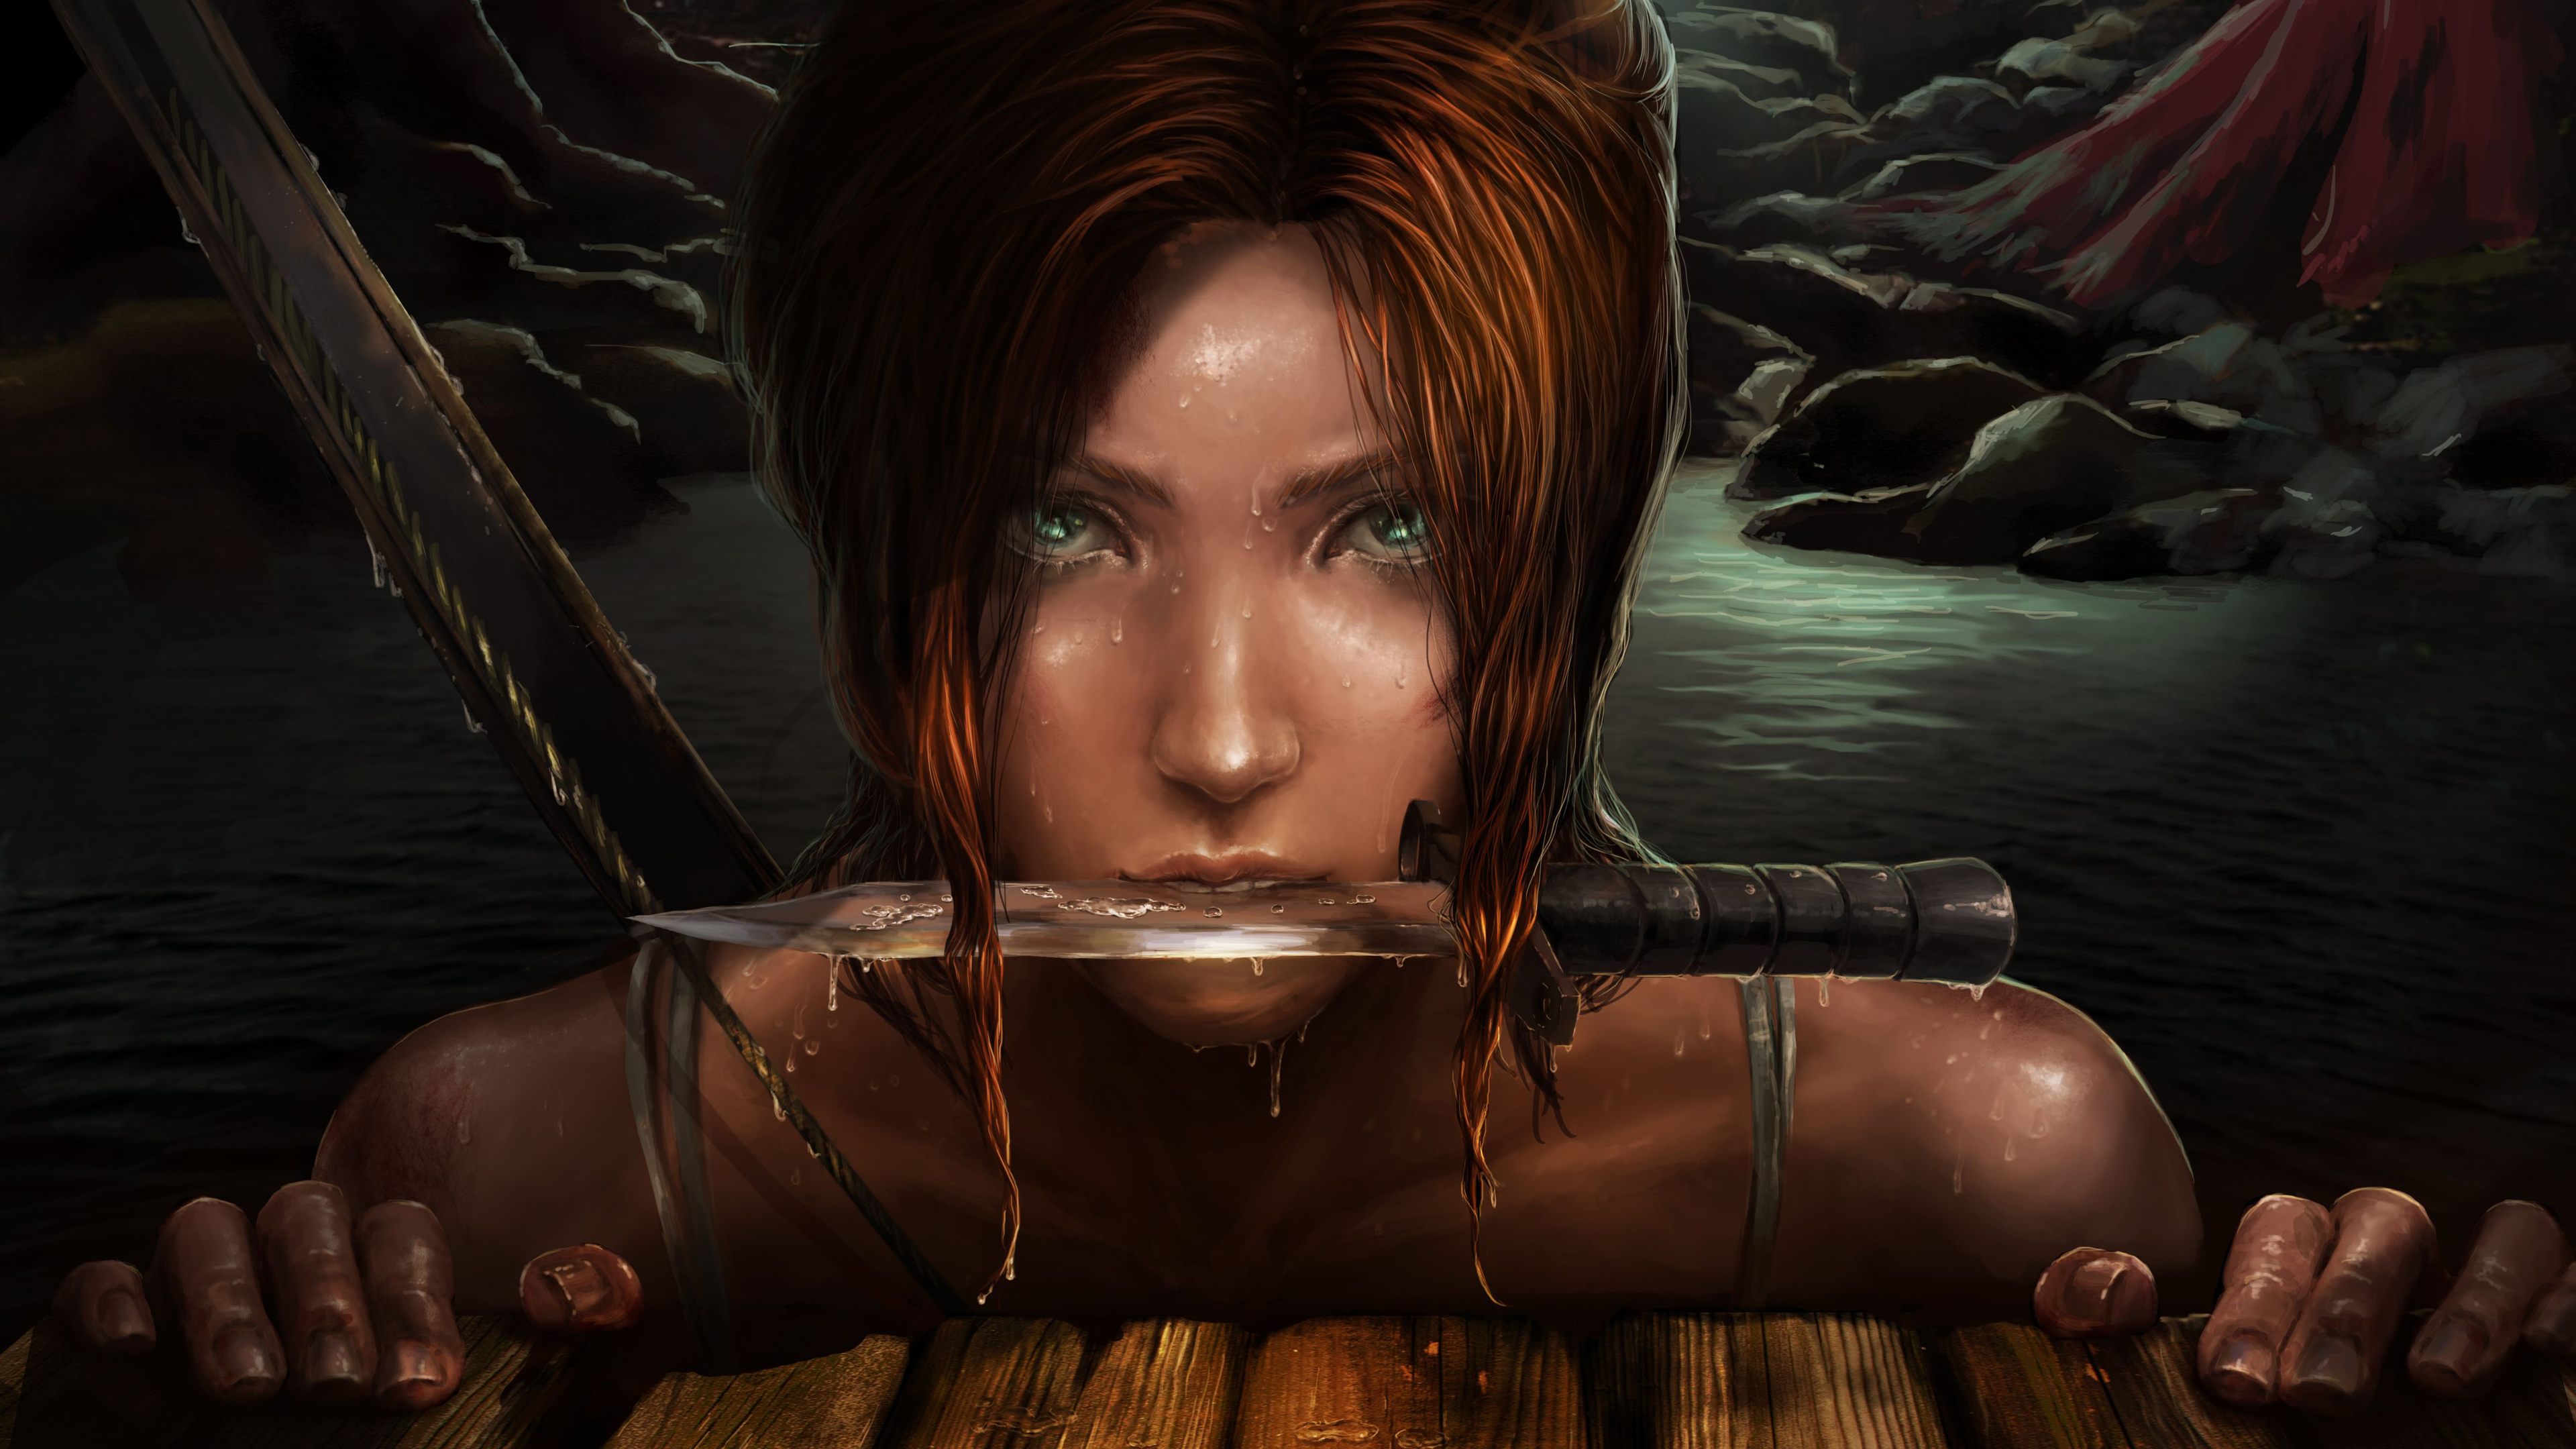 Wallpaper 4k Lara Croft Art 4k 4k Wallpapers Artwork